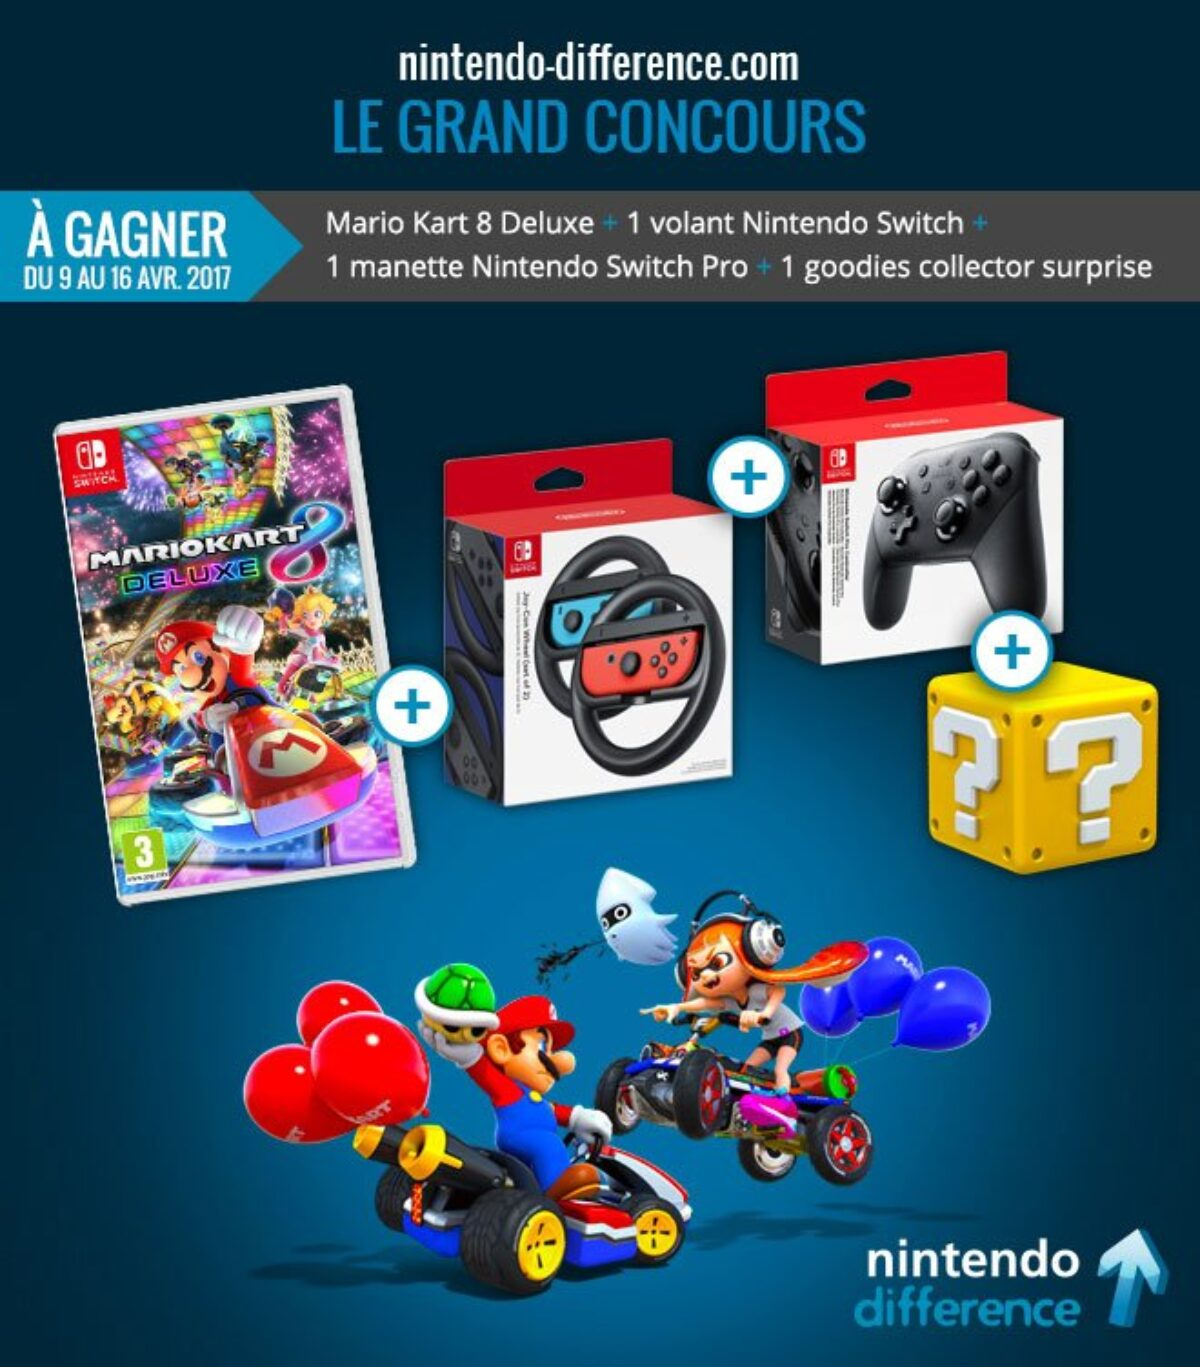 Concours : gagnez la combo Mario Kart 8 Deluxe + 2 volants + manette Switch Pro + 1 goodies collector